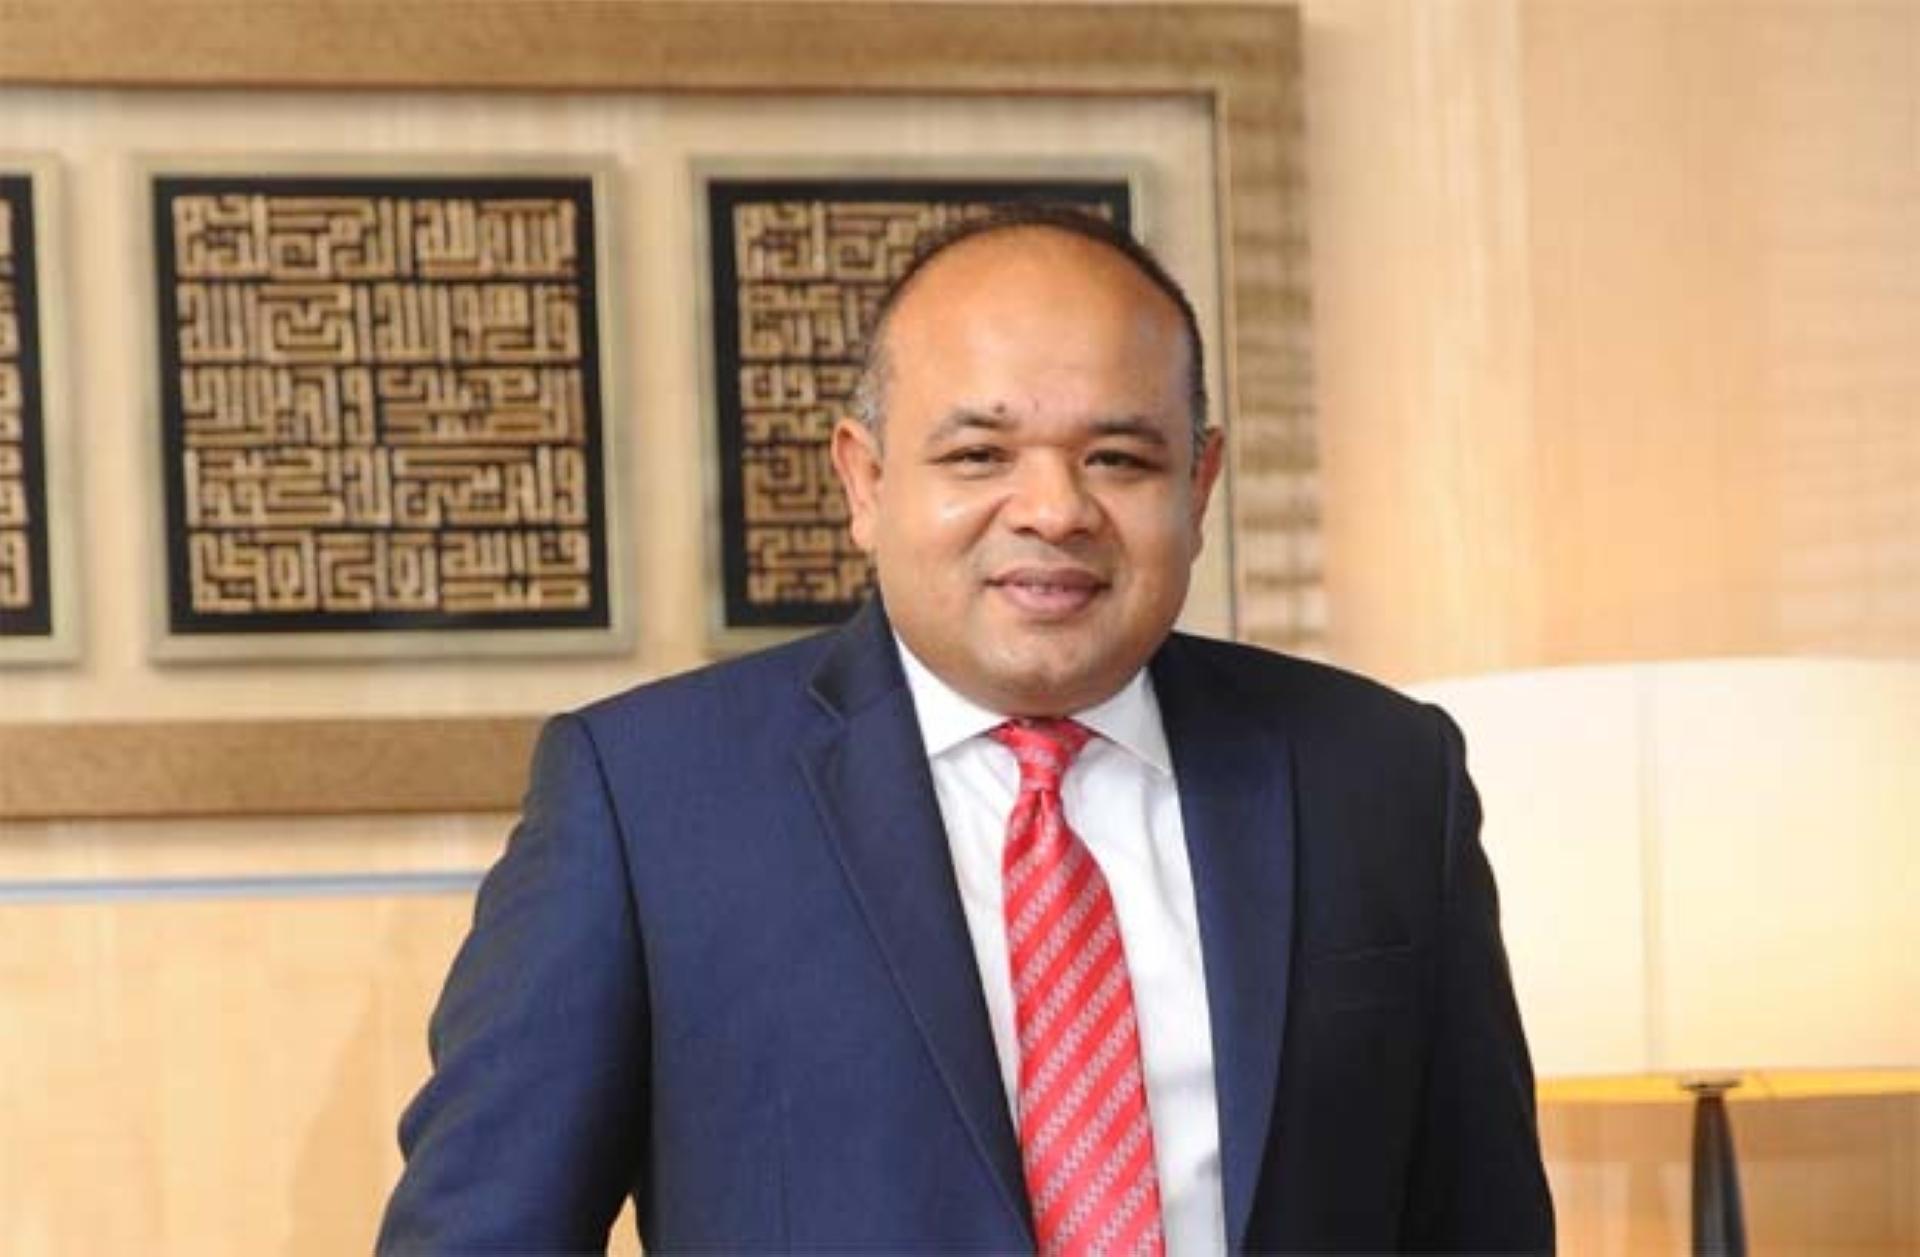 Khairul Appointed Ceo Of Bank Muamalat Malaysia The Star